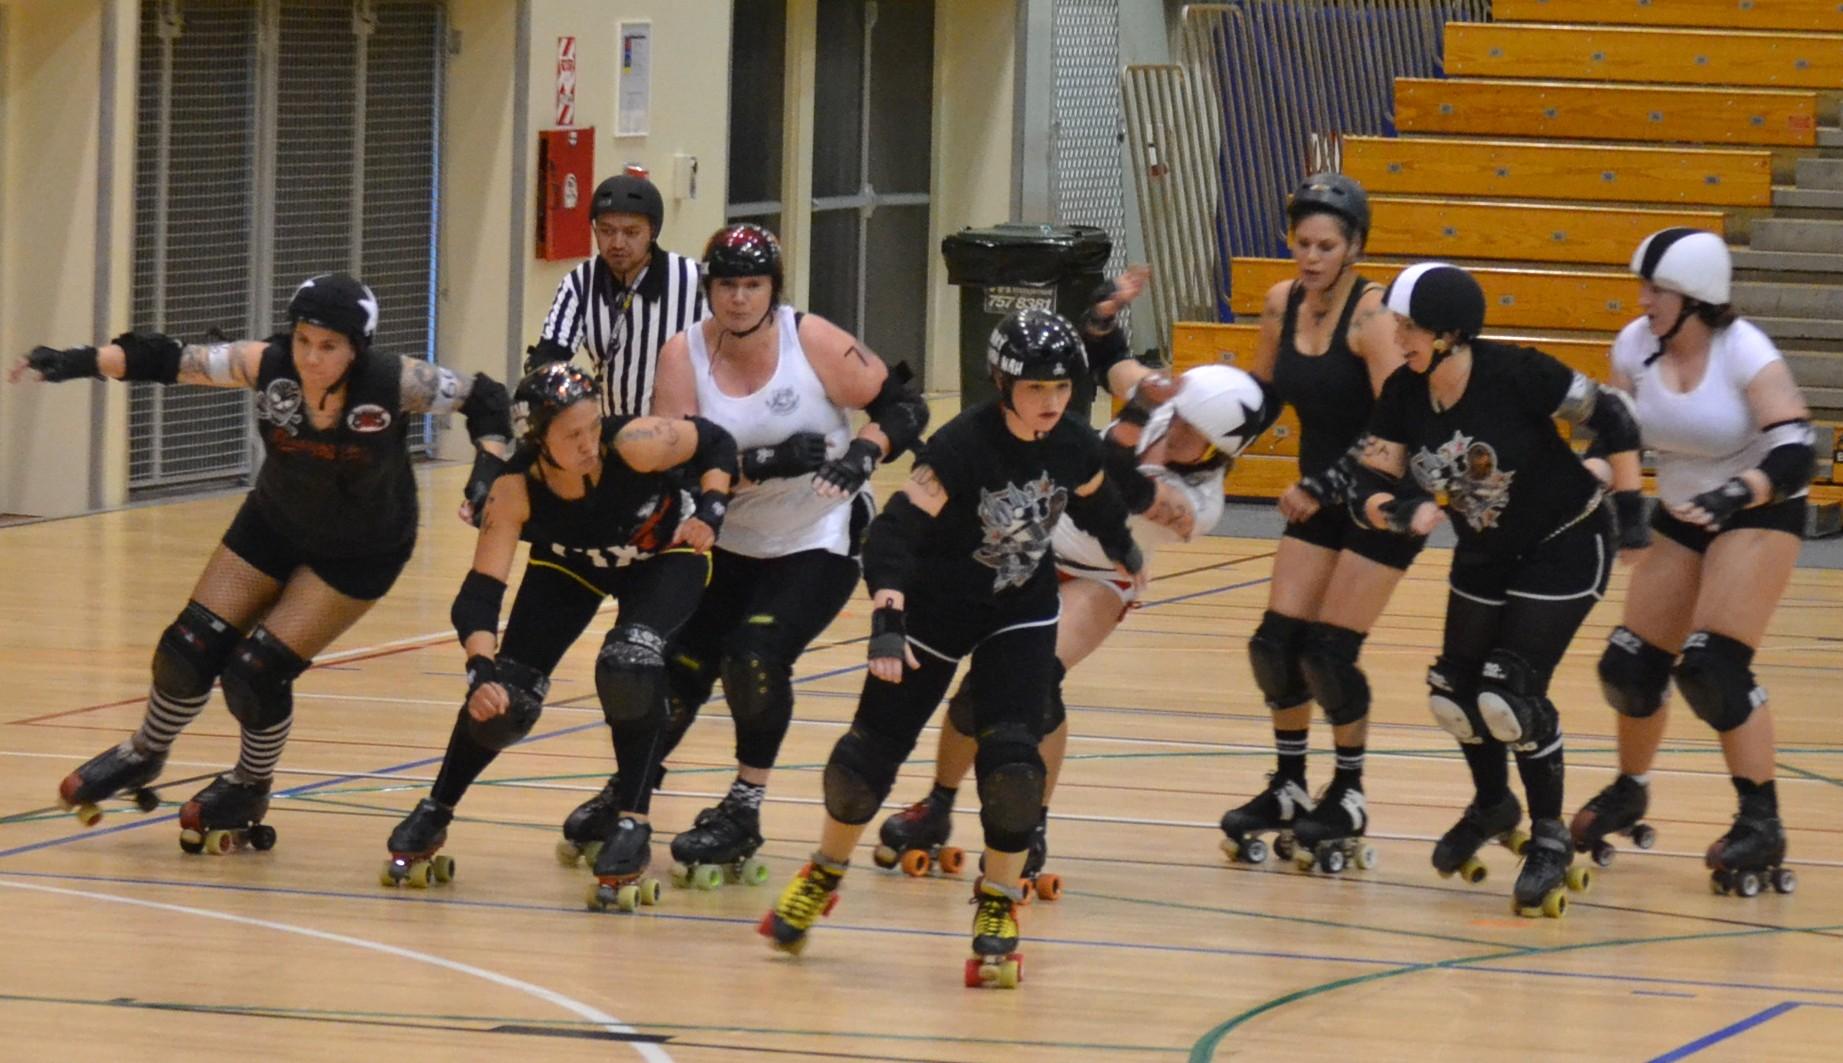 Roller skating new zealand -